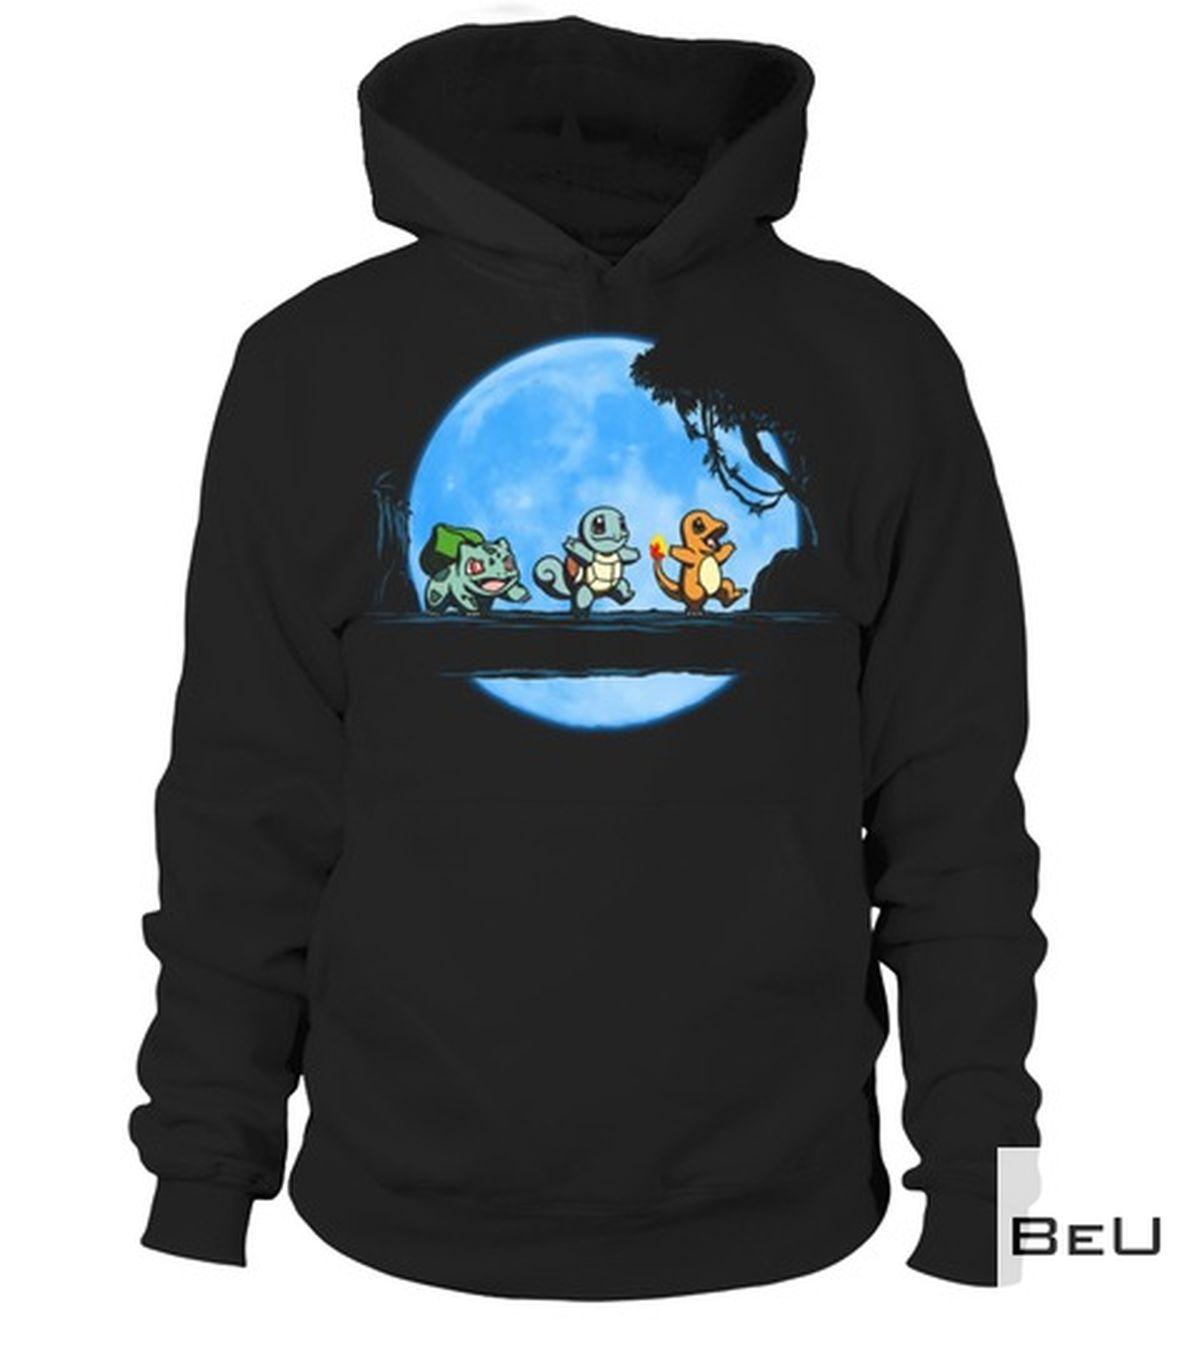 Sale Off Pokemon Baby Bulbasaur Squirtle Charizard Blue Moon Shirt, hoodie, tank top